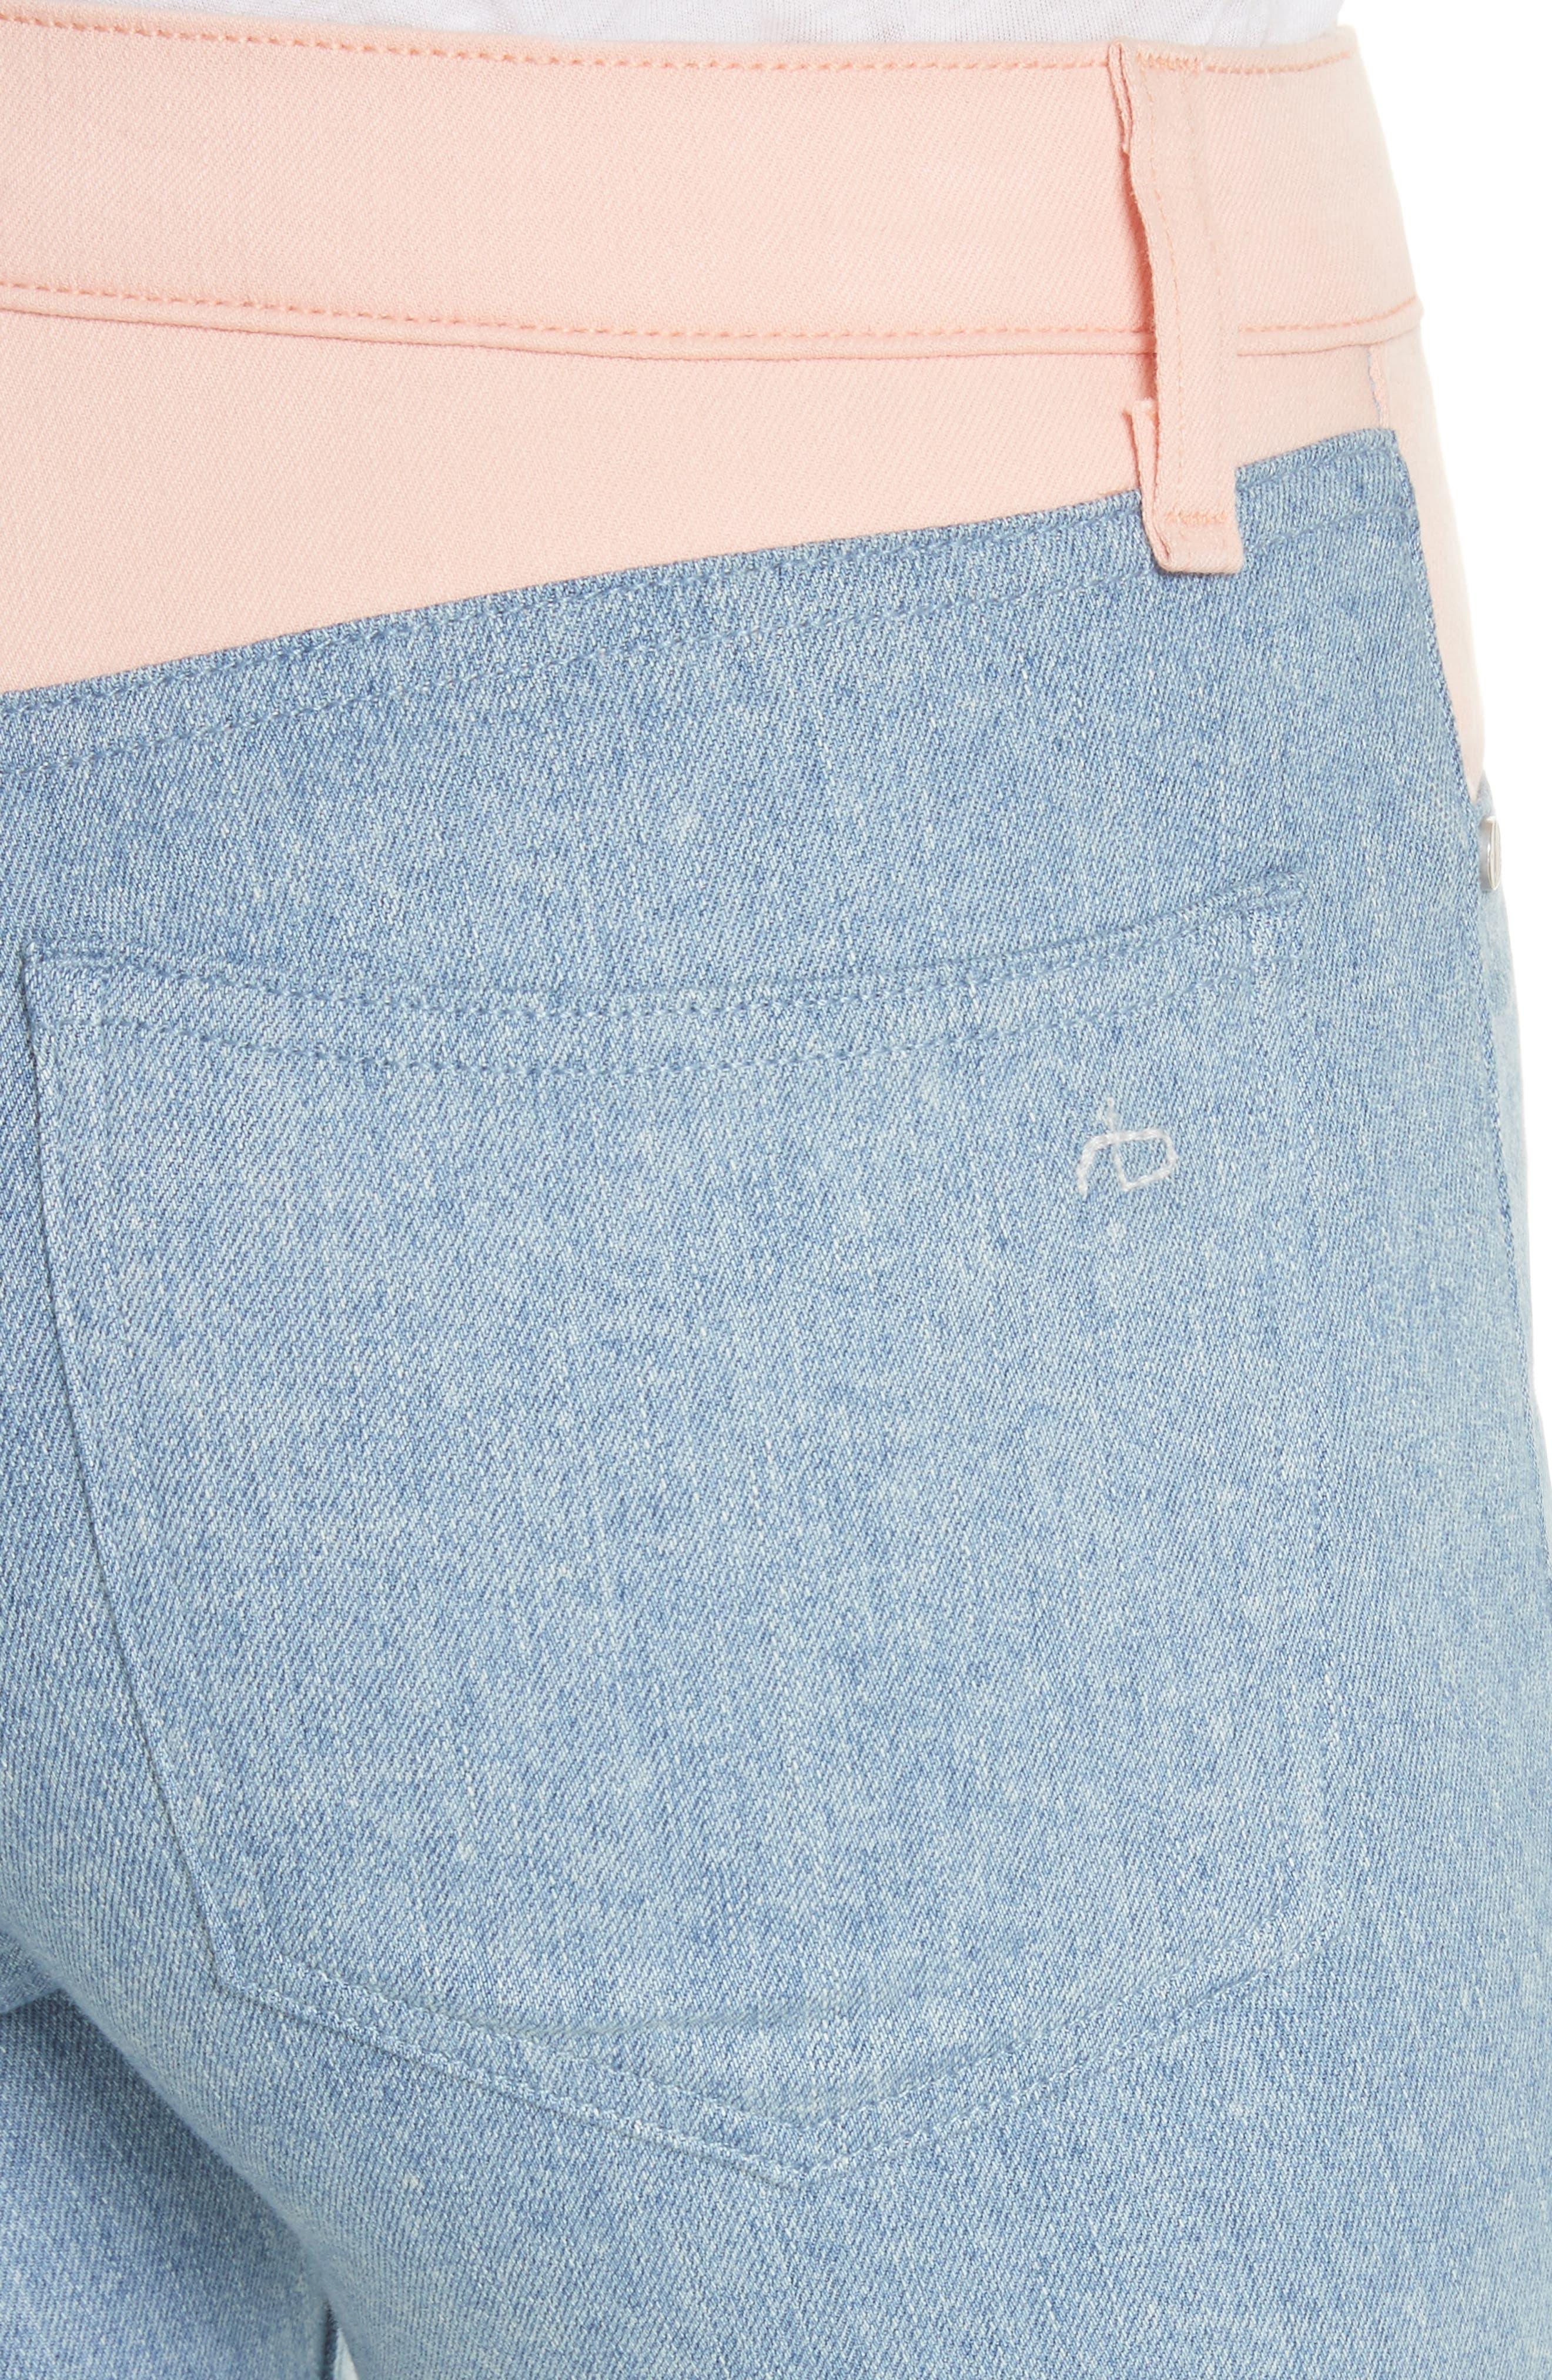 Phila Skinny Jeans,                             Alternate thumbnail 4, color,                             450